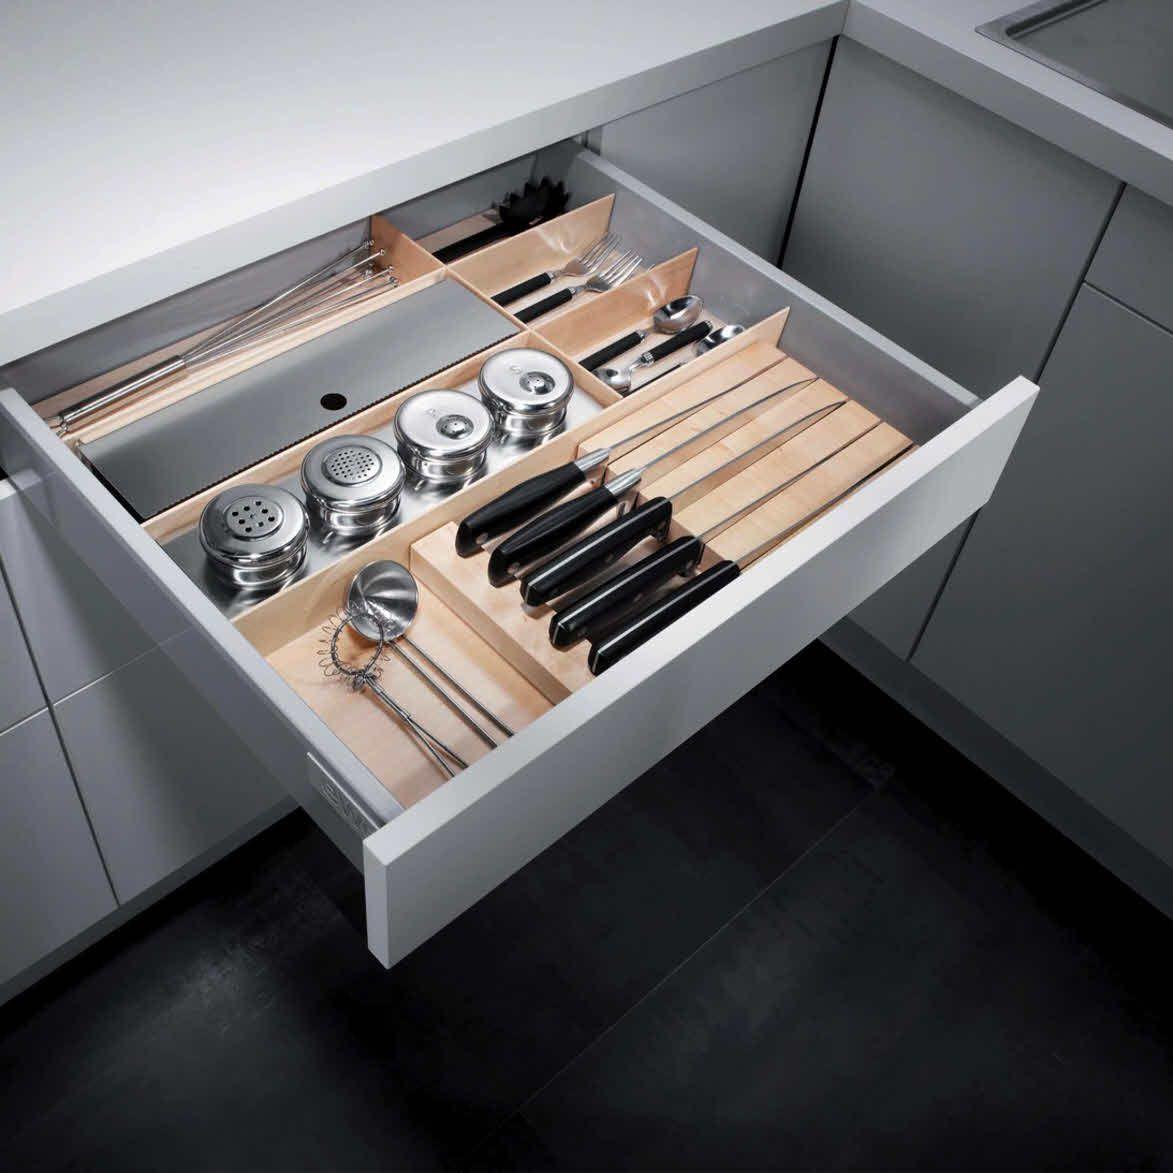 pure goldreif kitchen interior wooden drawers kitchen accessories on kitchen interior accessories id=15835